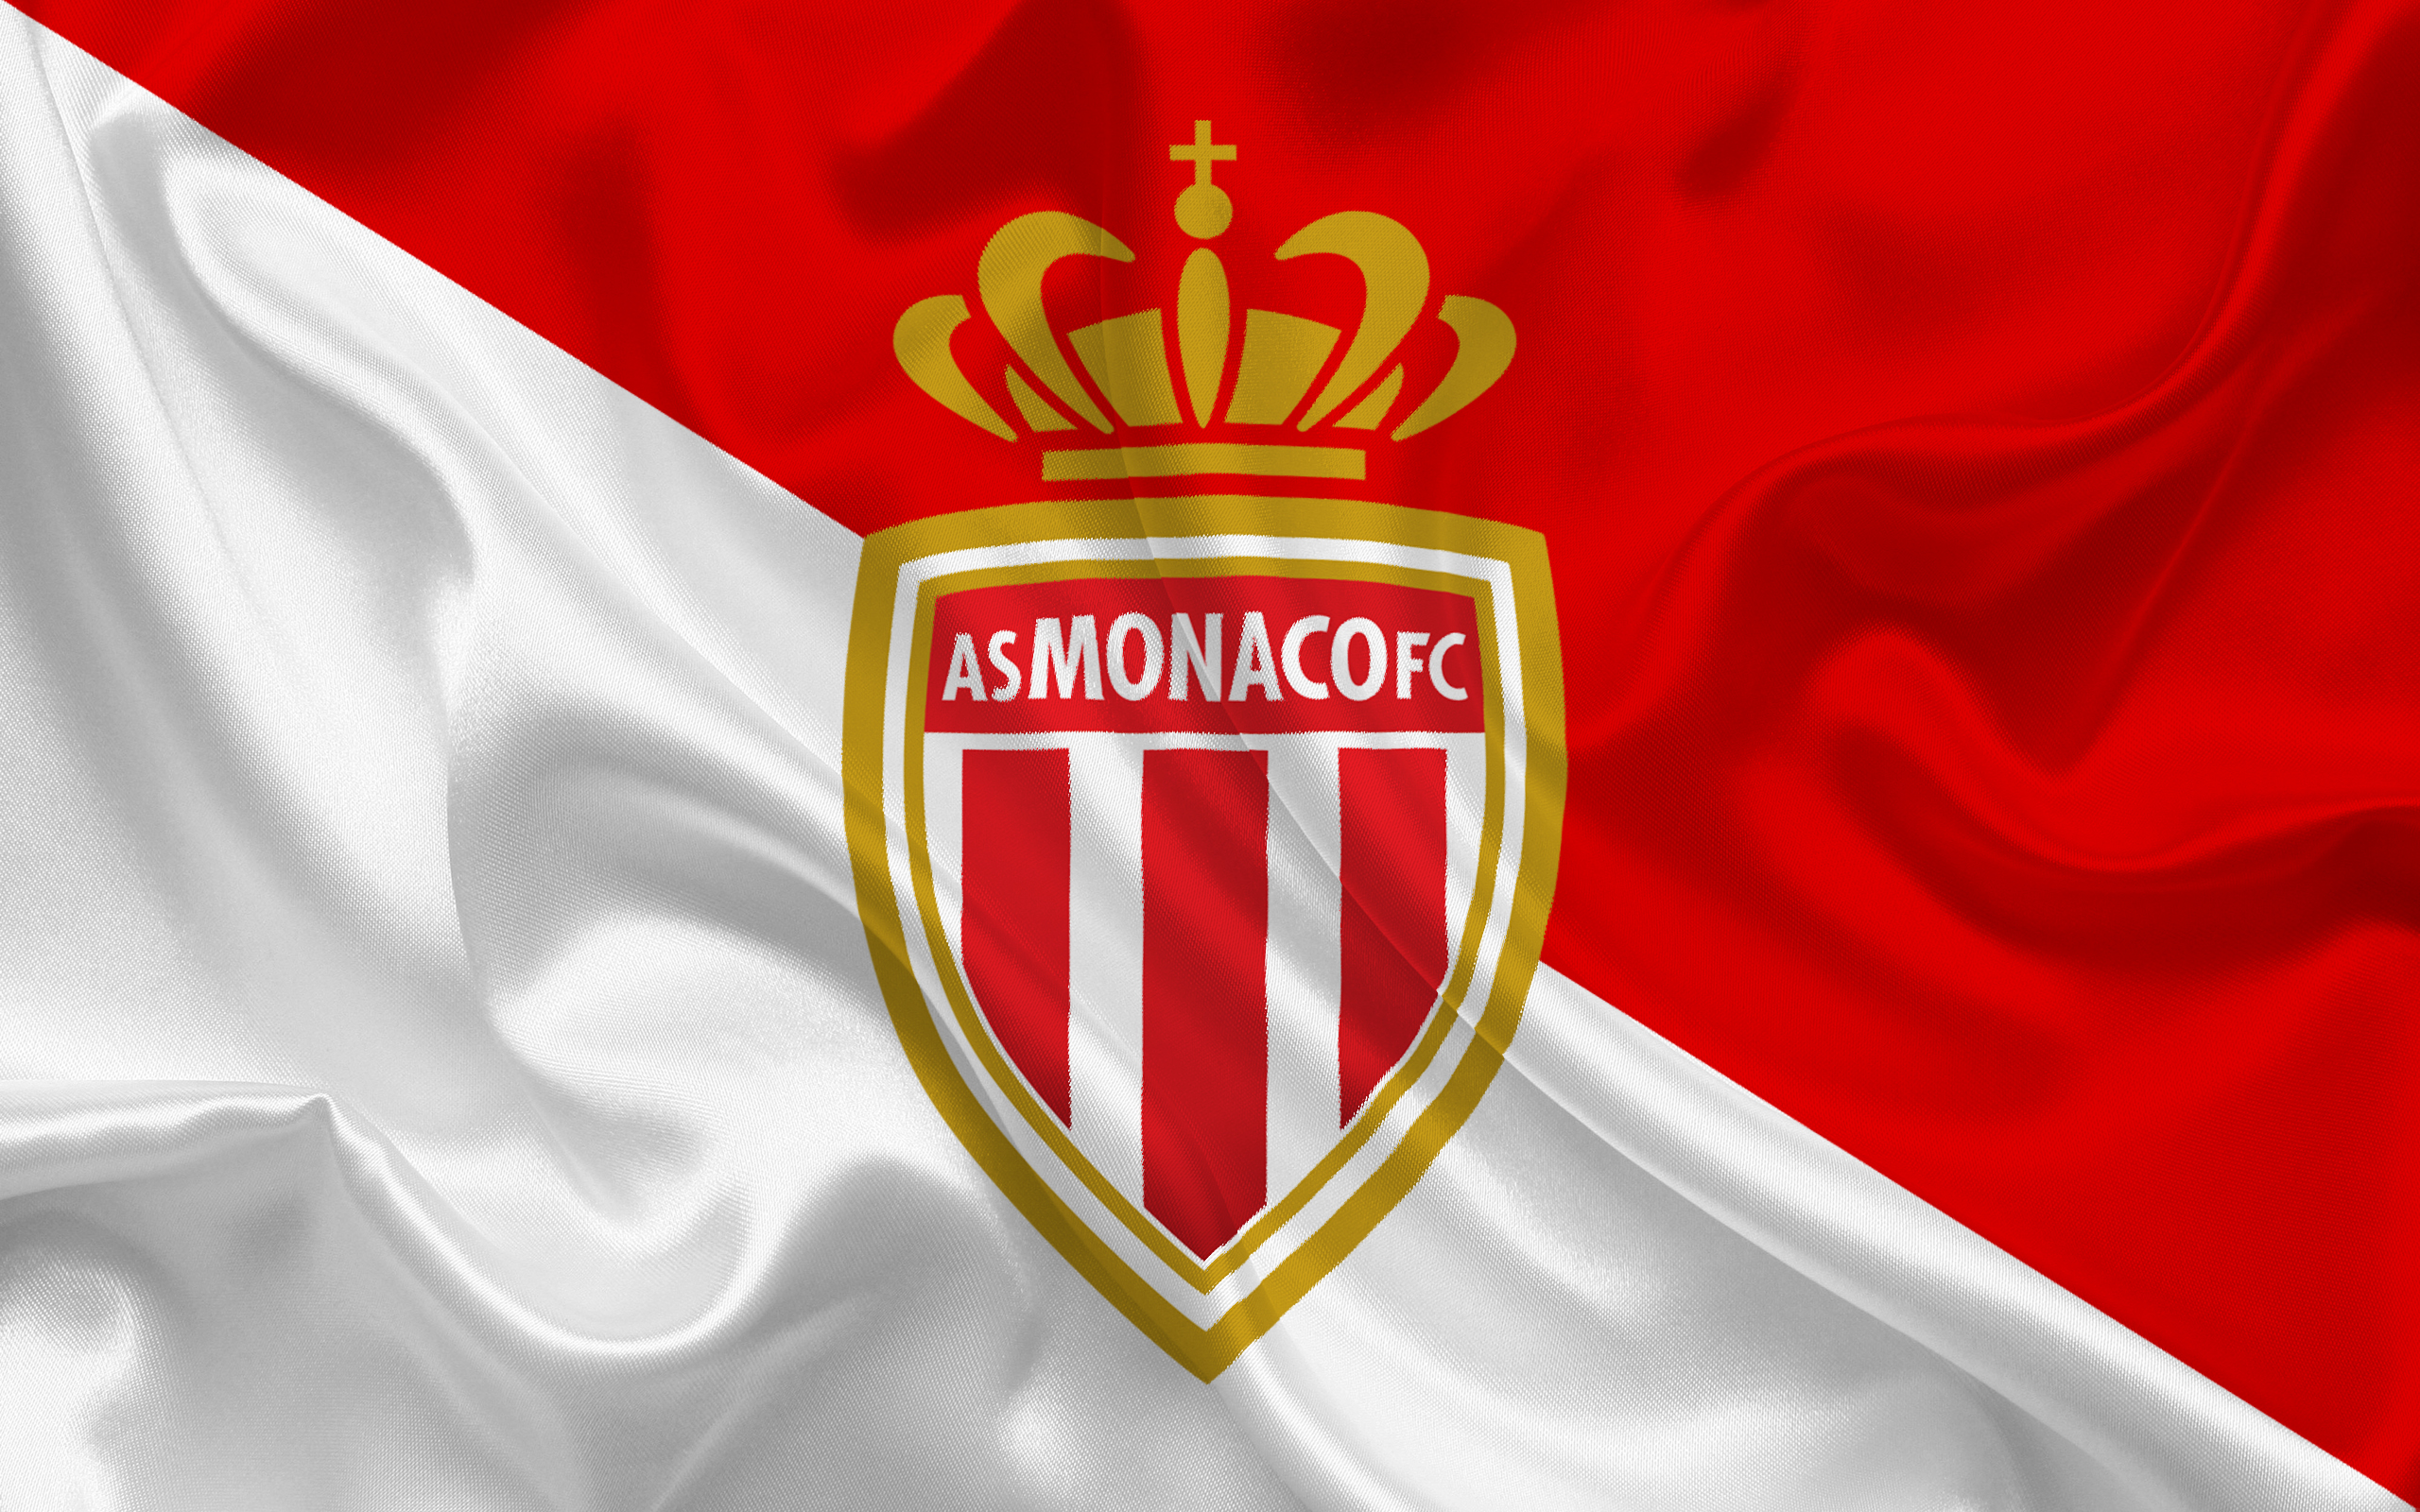 AS Monaco FC HD Wallpaper Background Image 2560x1600 ID 2560x1600